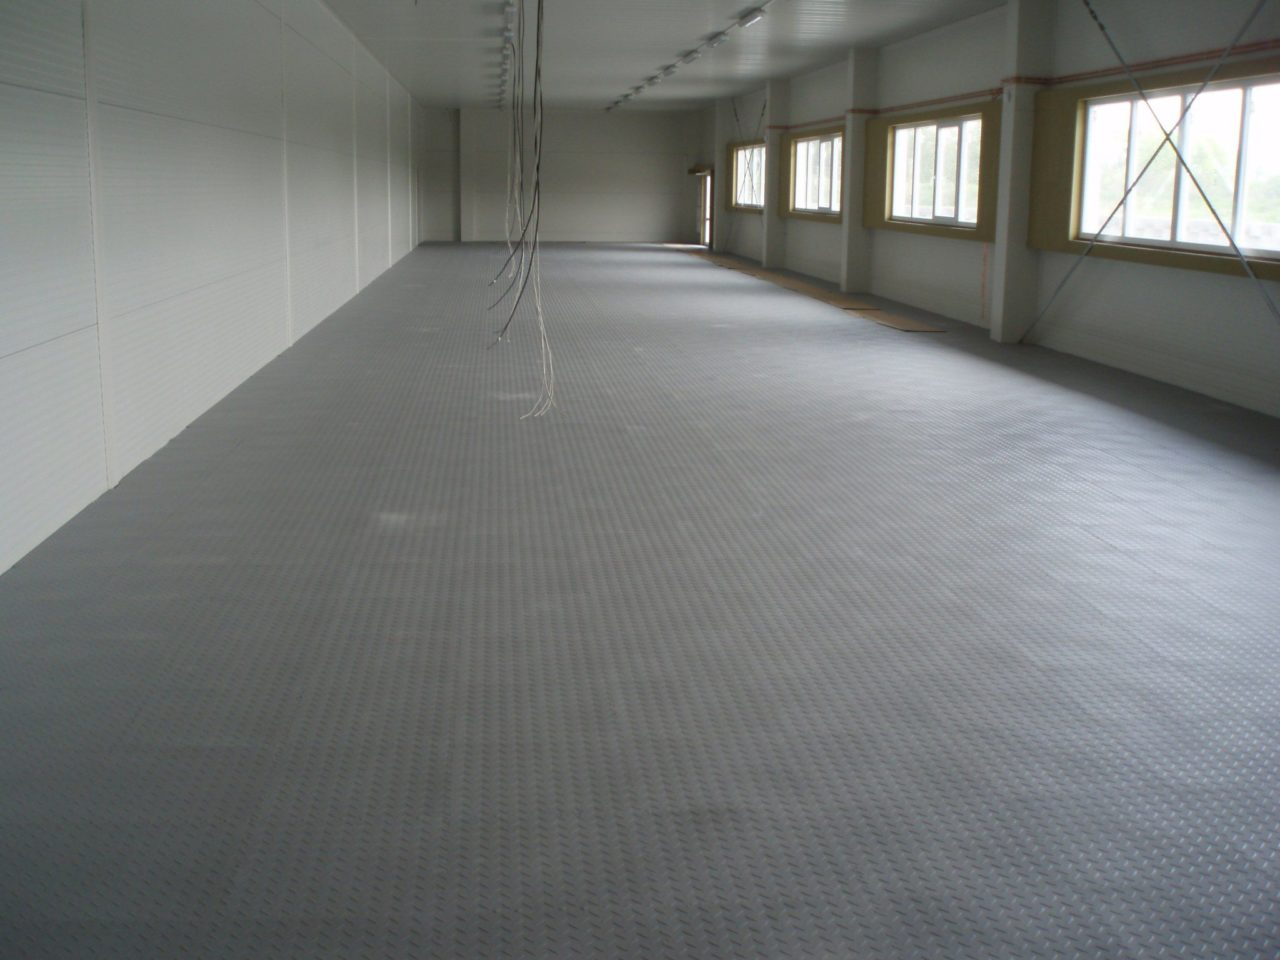 Super PVC Industrieboden & Industriefußboden fugenlos als SN28